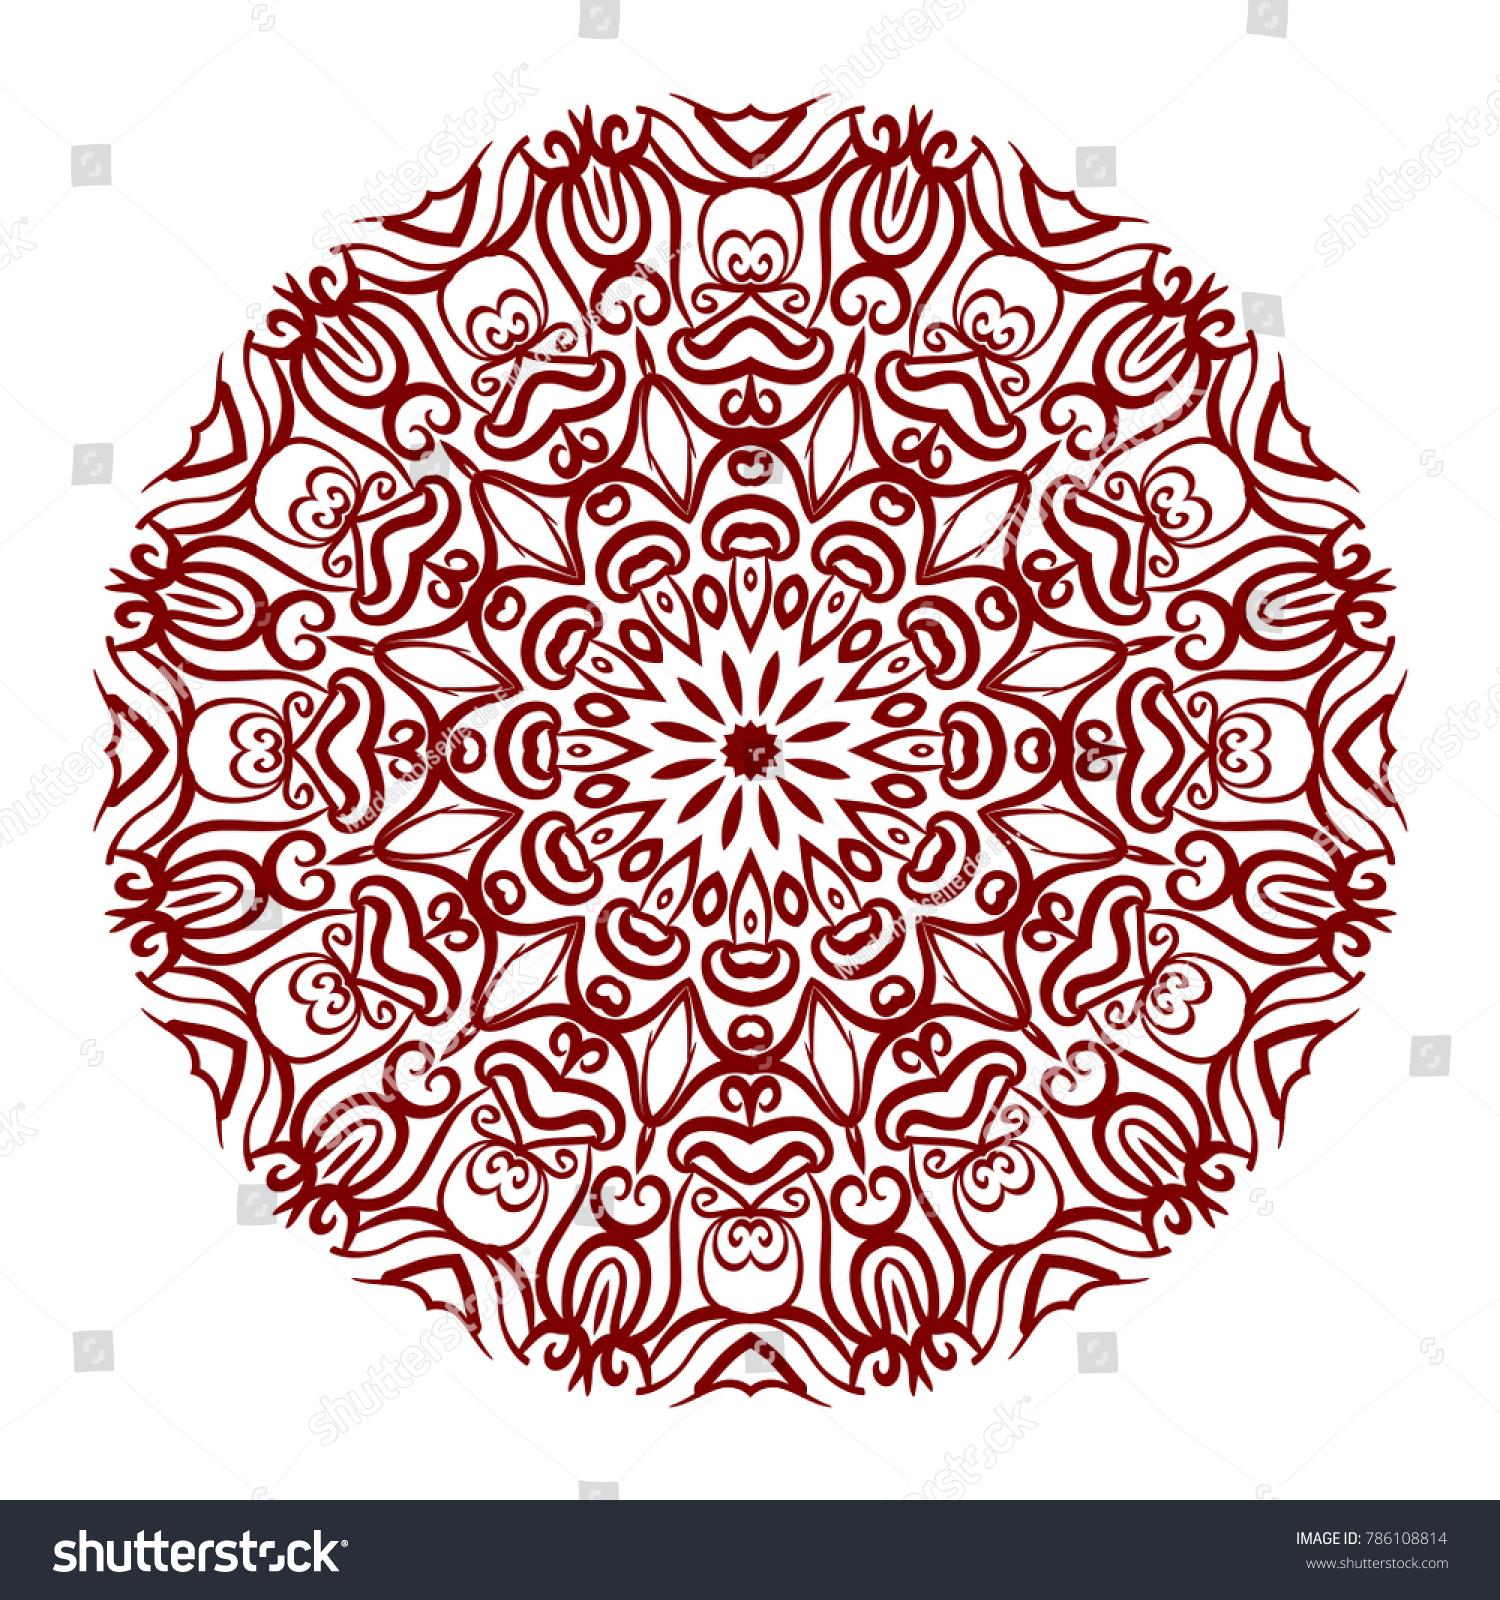 Abstract Flower Design Mandala Decorative Round Stock Photo (Photo ...